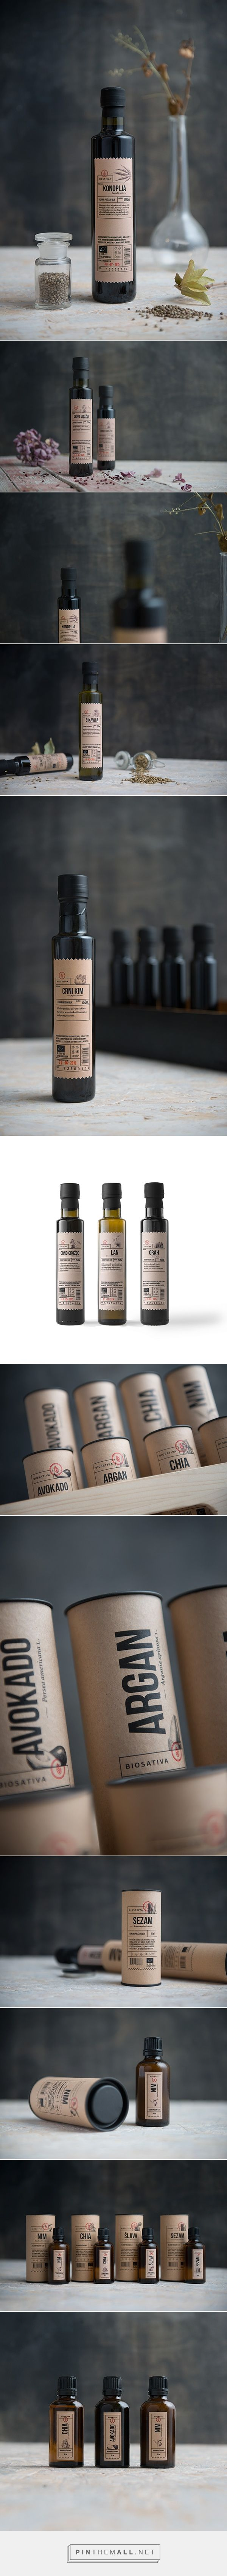 Biosativa   Oil Packaging by Negra Nigoevic